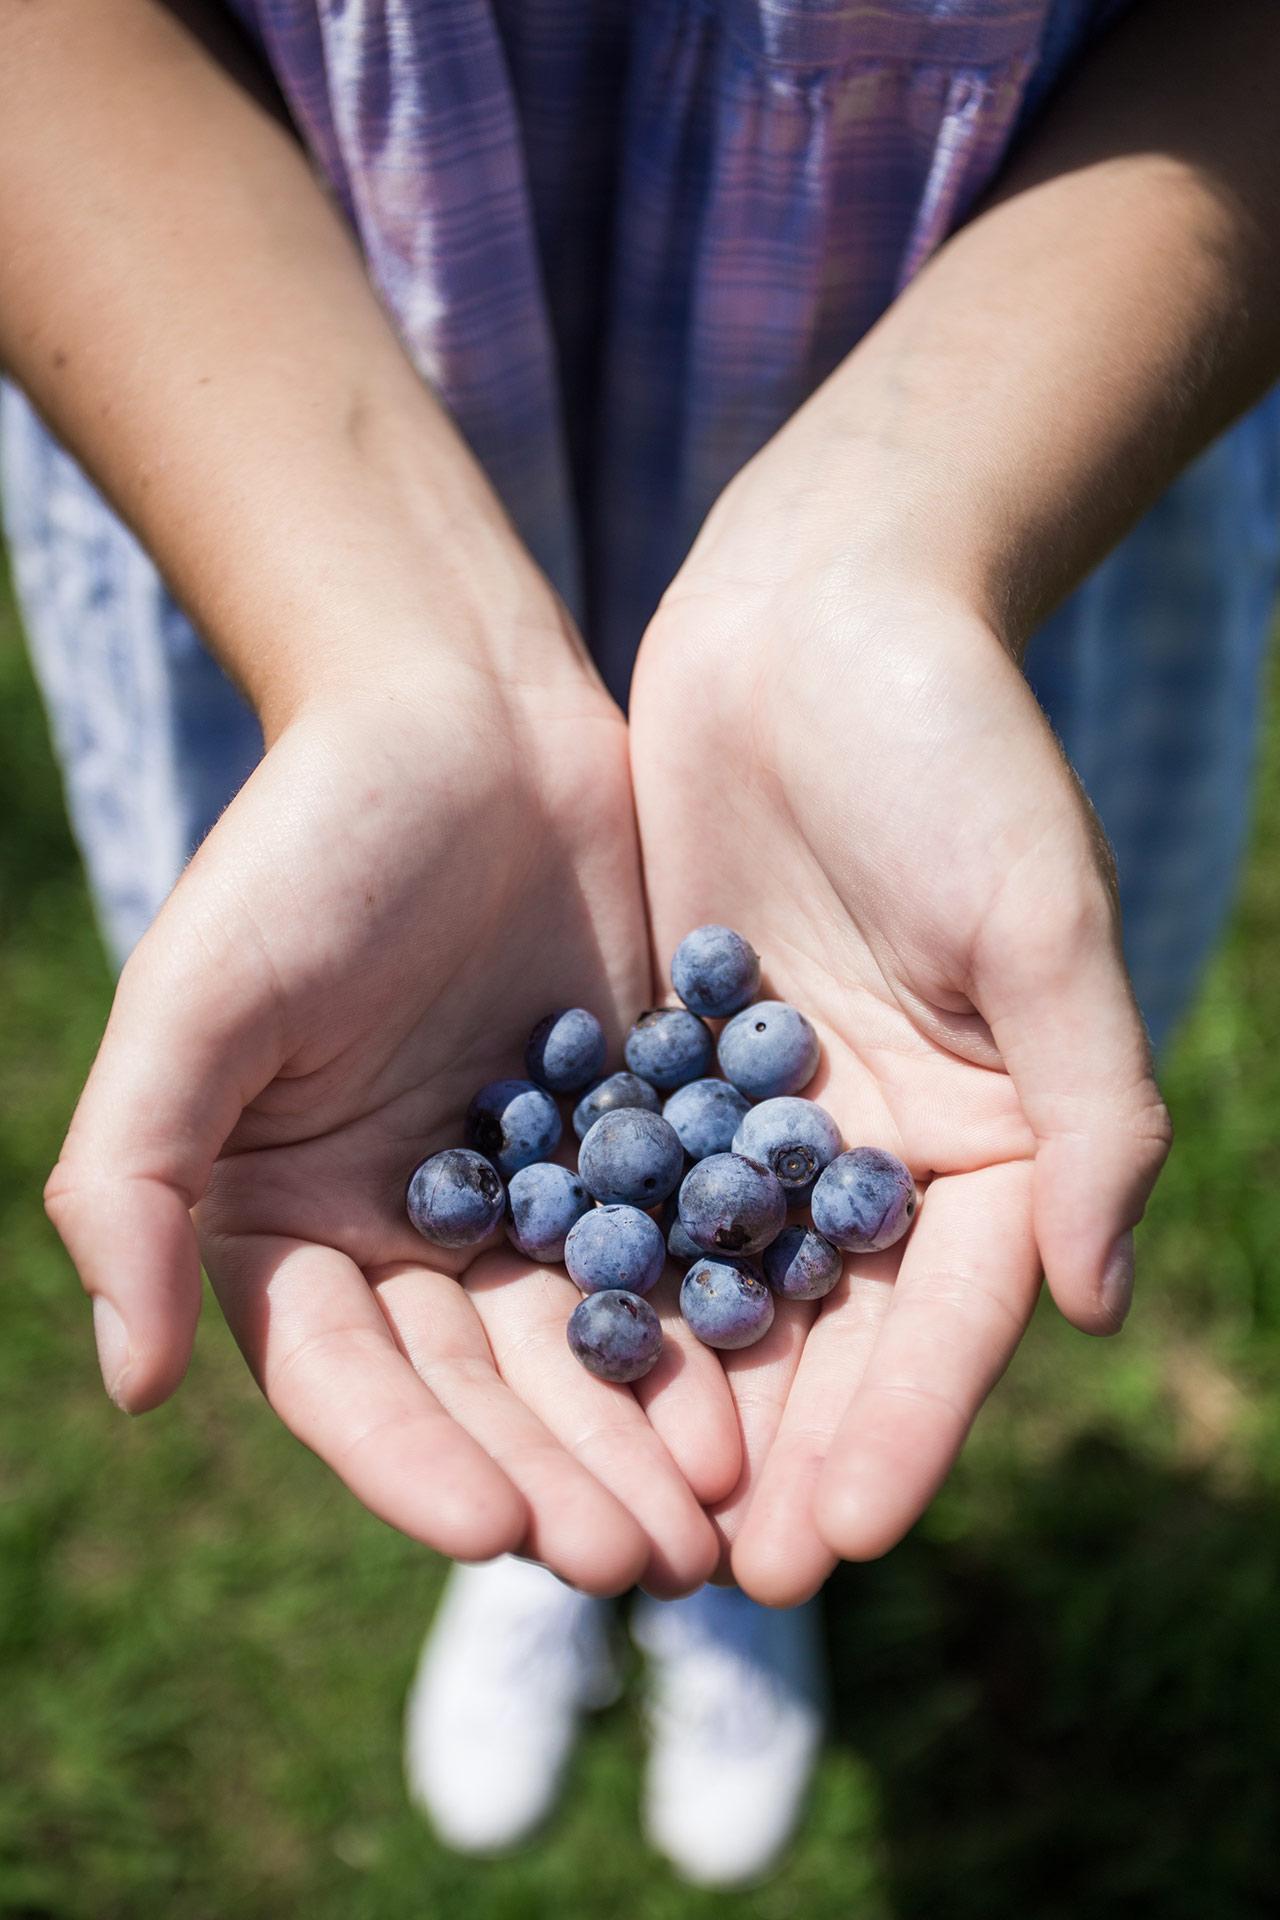 Pungo Virginia Beach blueberries don't reuse